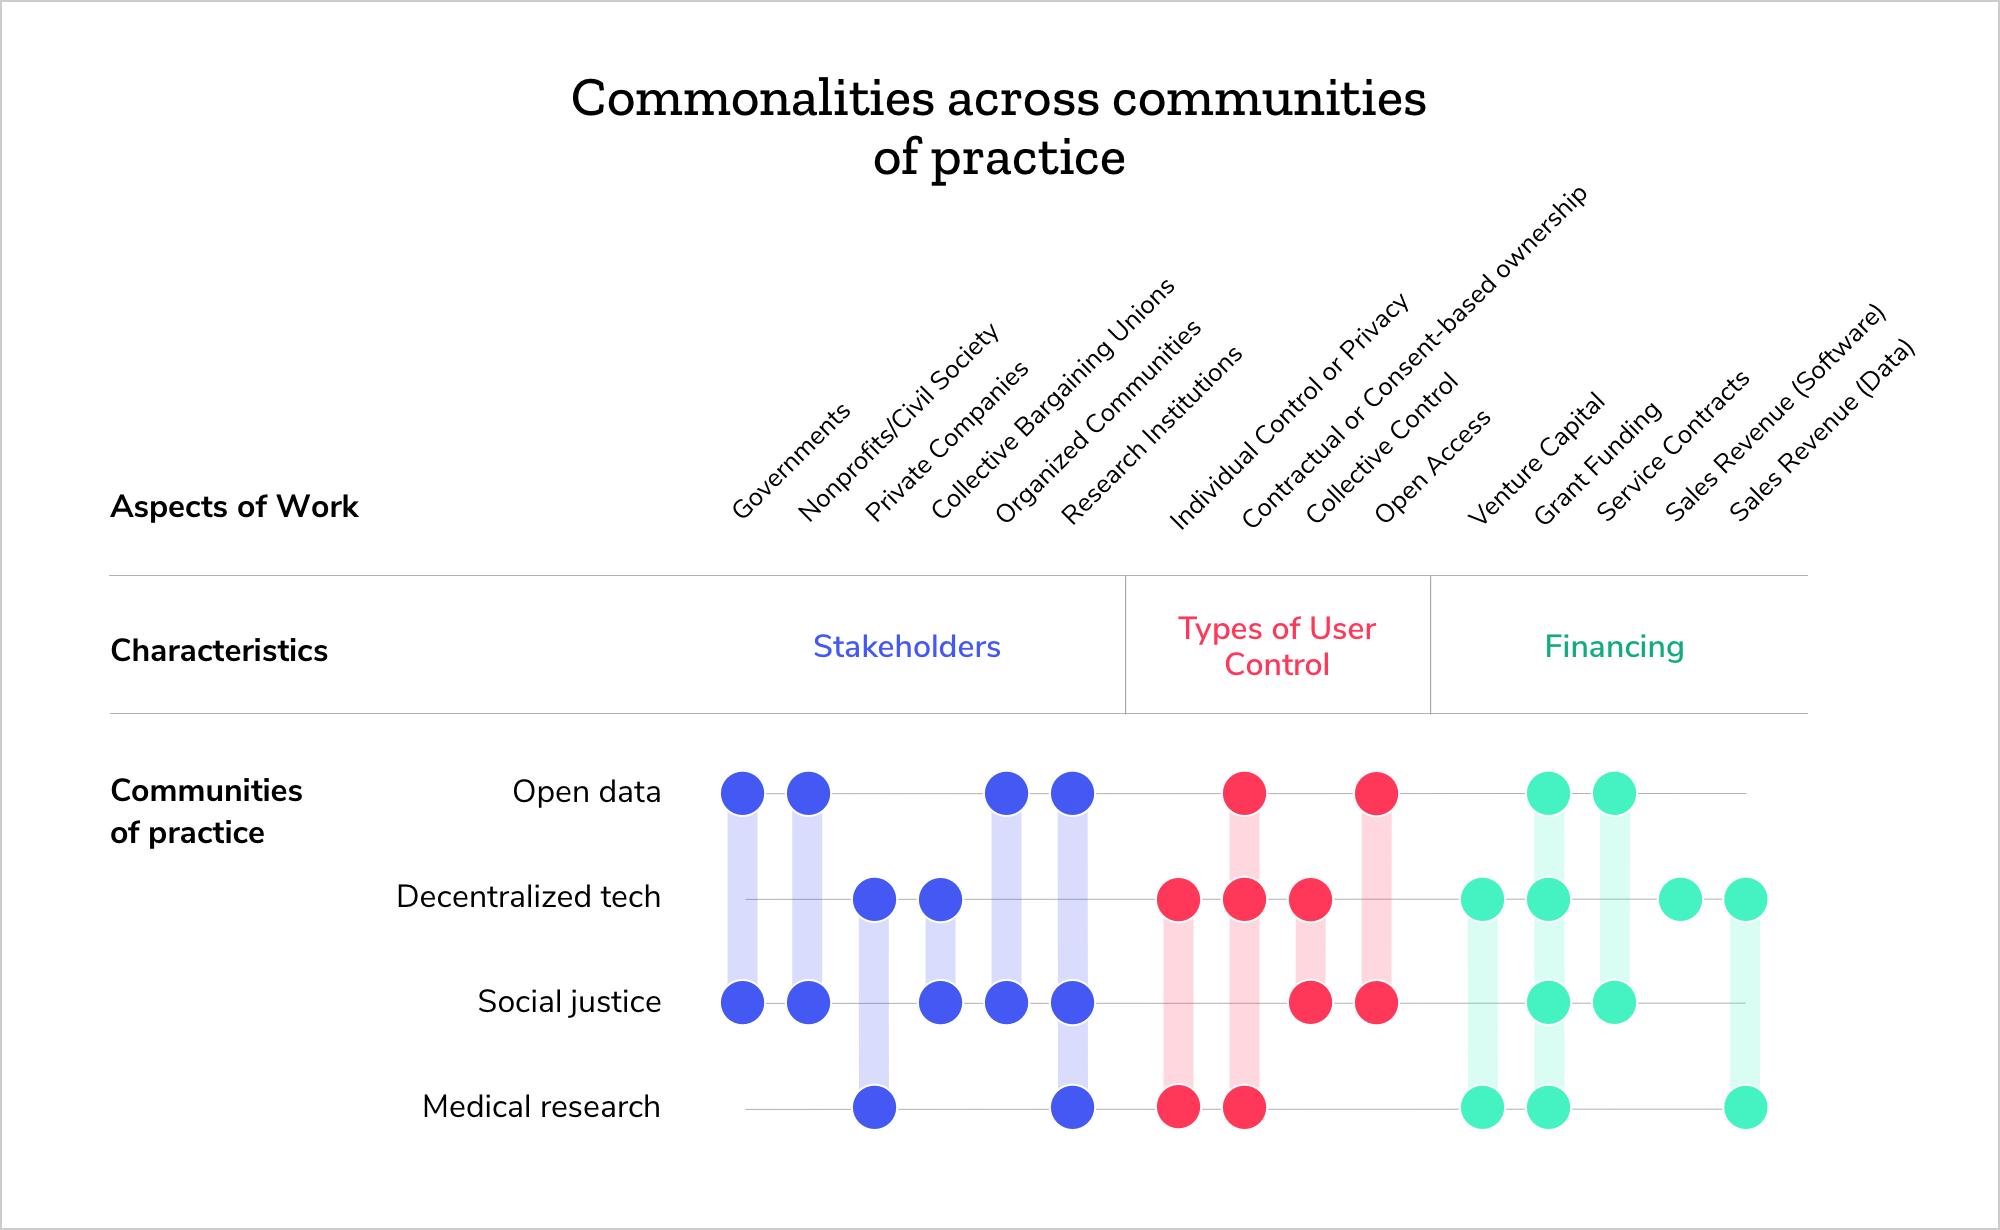 figure: A graphic showing commonalities across communities of practice